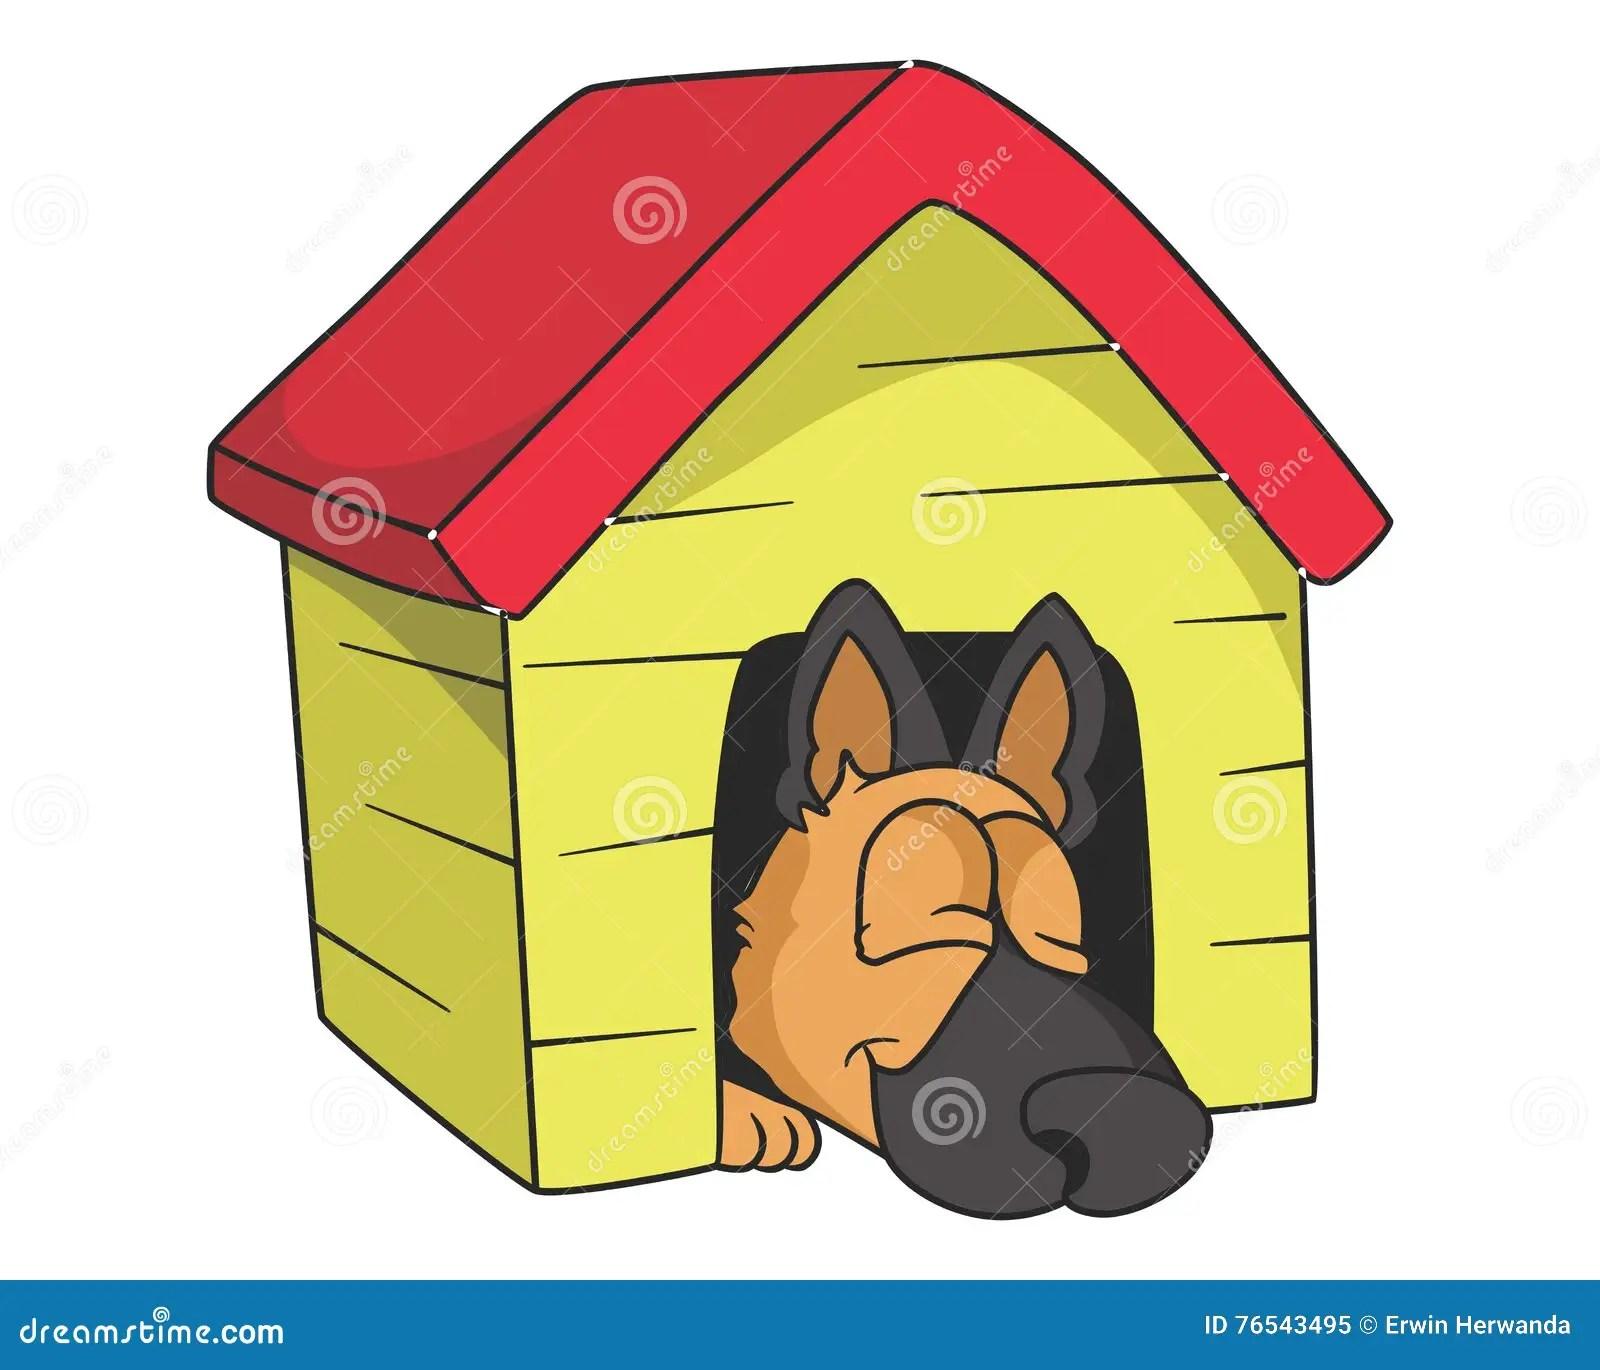 hight resolution of sleeping dog illustration with gradients stock illustration